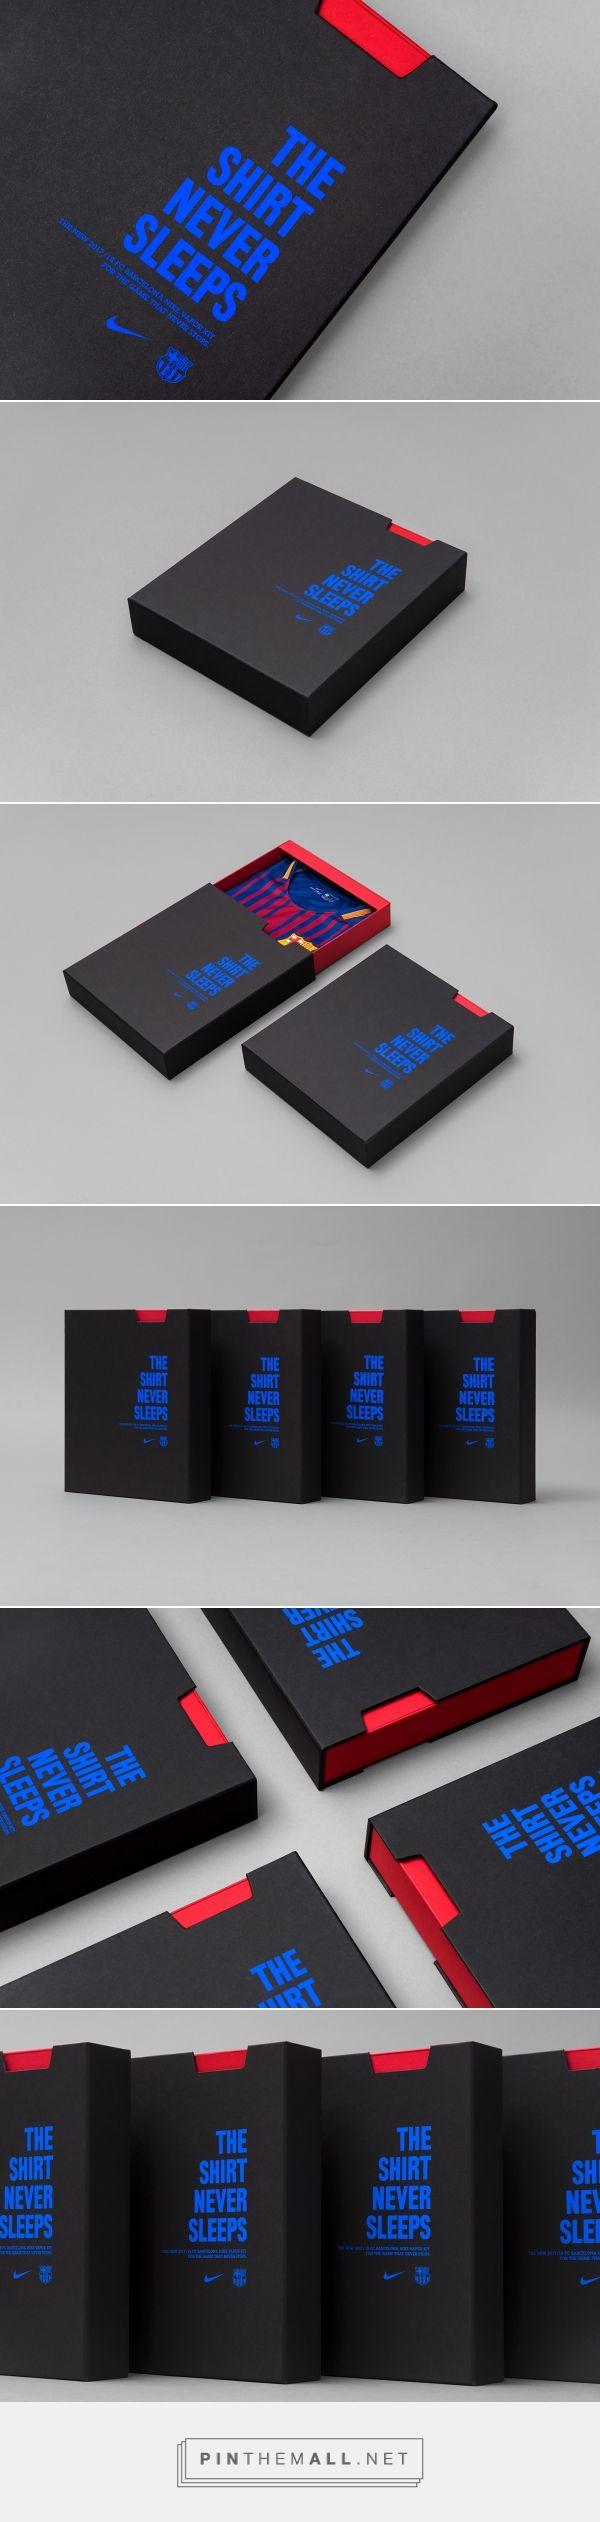 FC Barcelona 2017-18 Jersey packaging design by Oxigen - http://www.packagingoftheworld.com/2017/07/fc-barcelona-2017-18-official-jersey.html - created via https://pinthemall.net